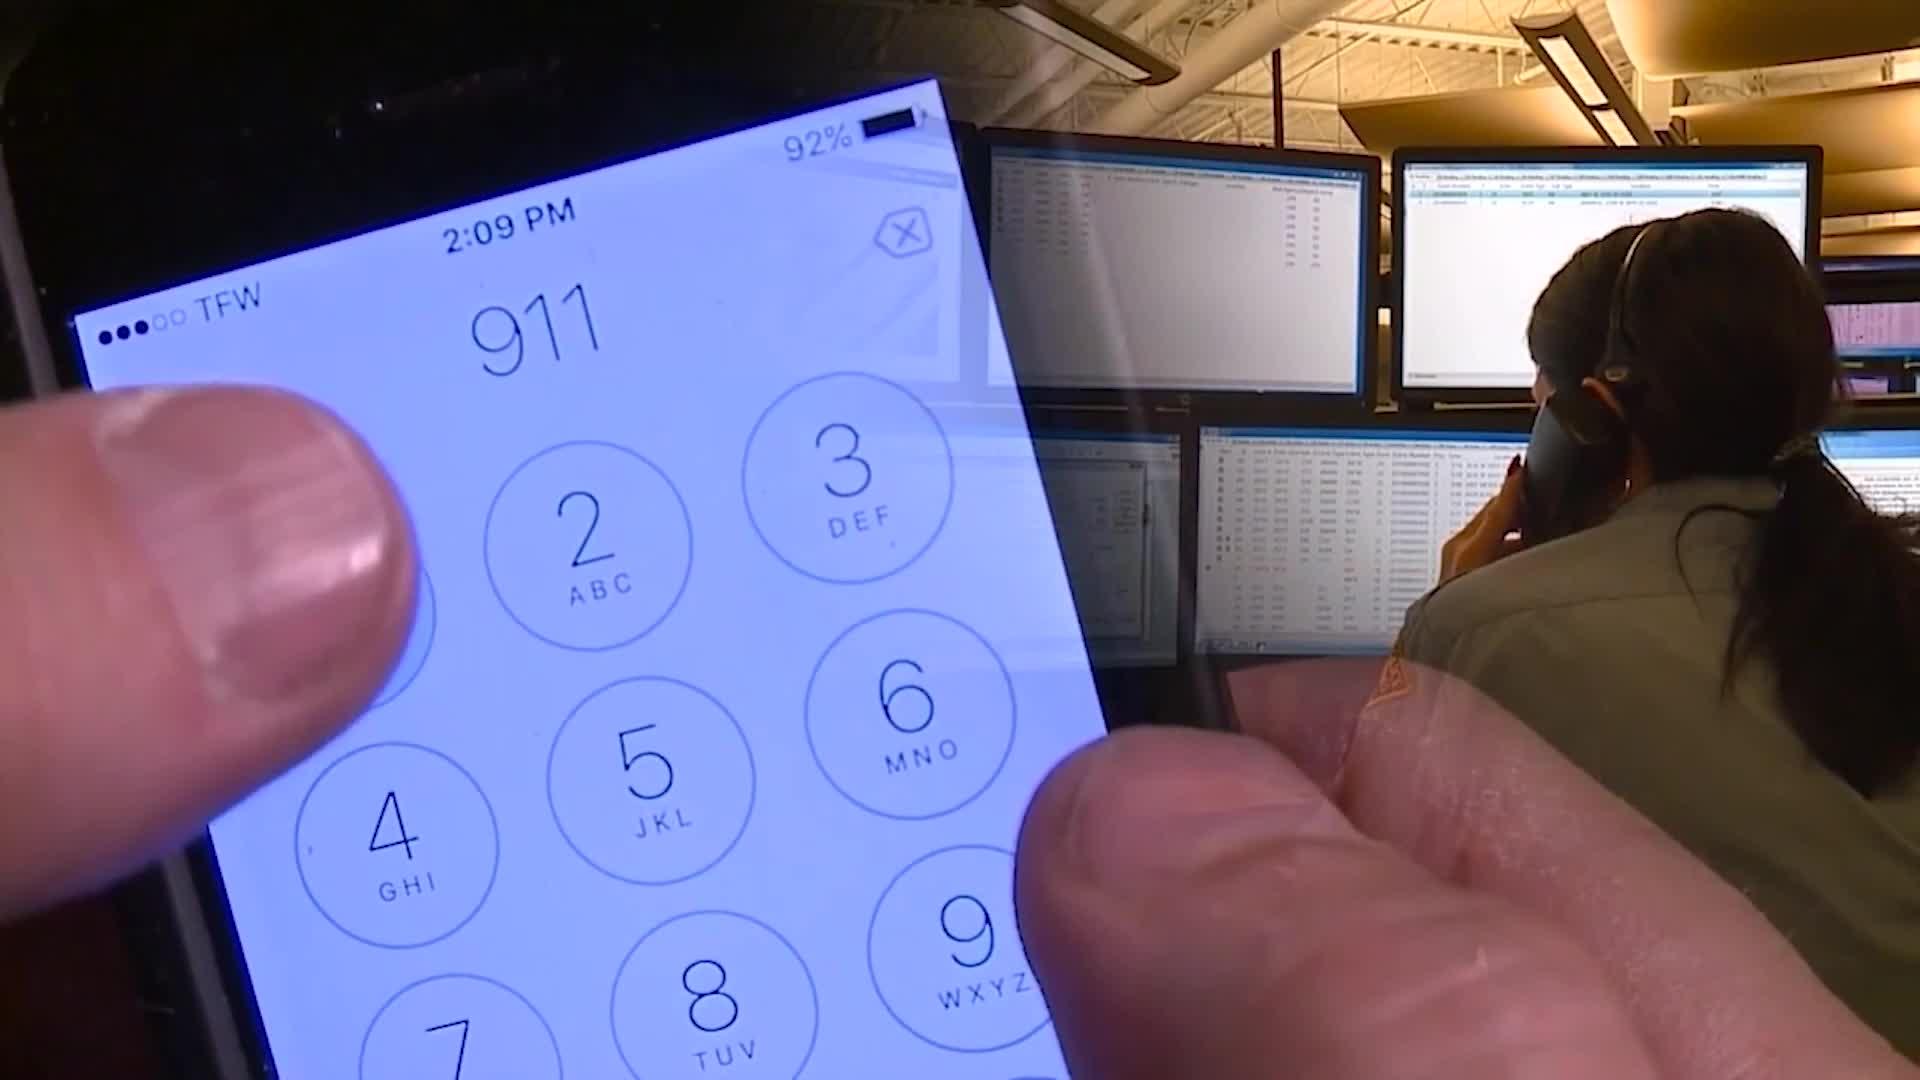 911 Call, Dispatch